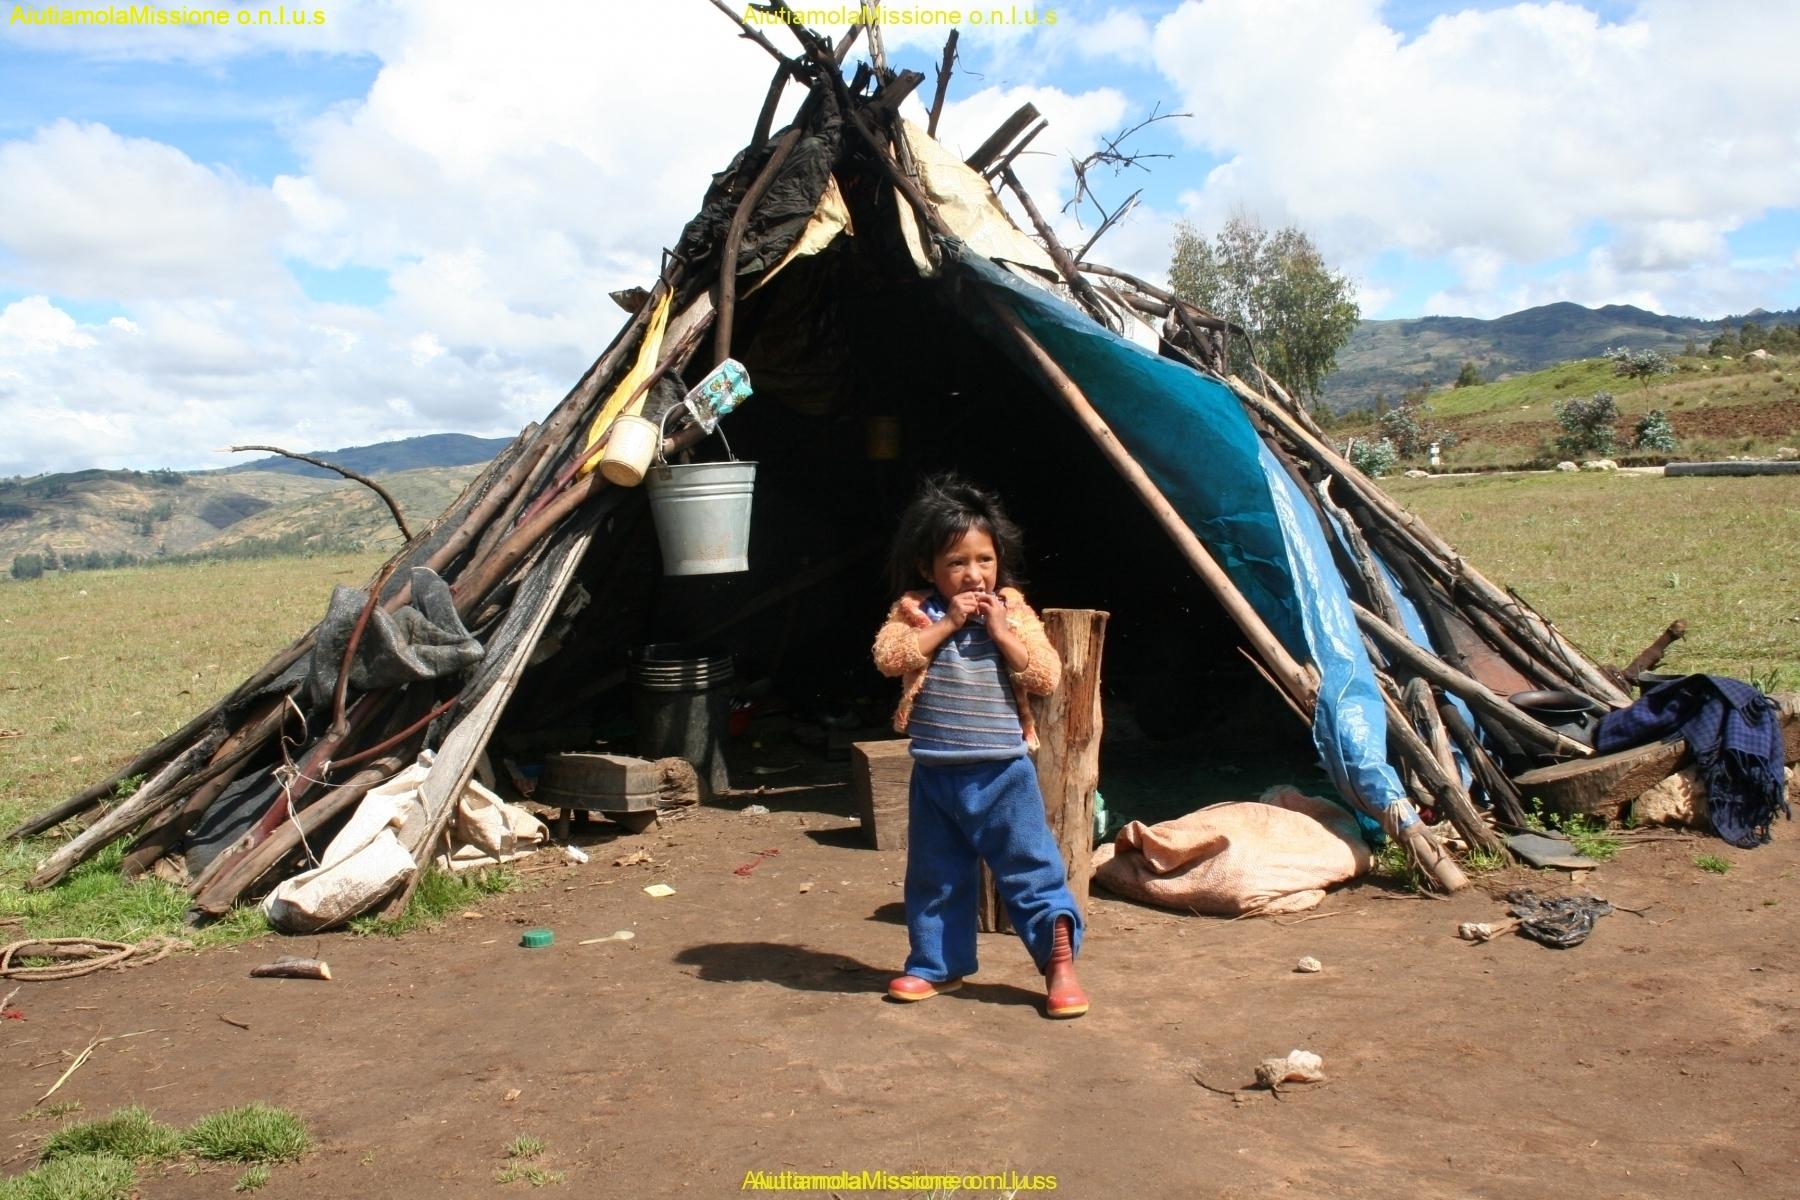 PERU-DICEMBRE-2011-1580